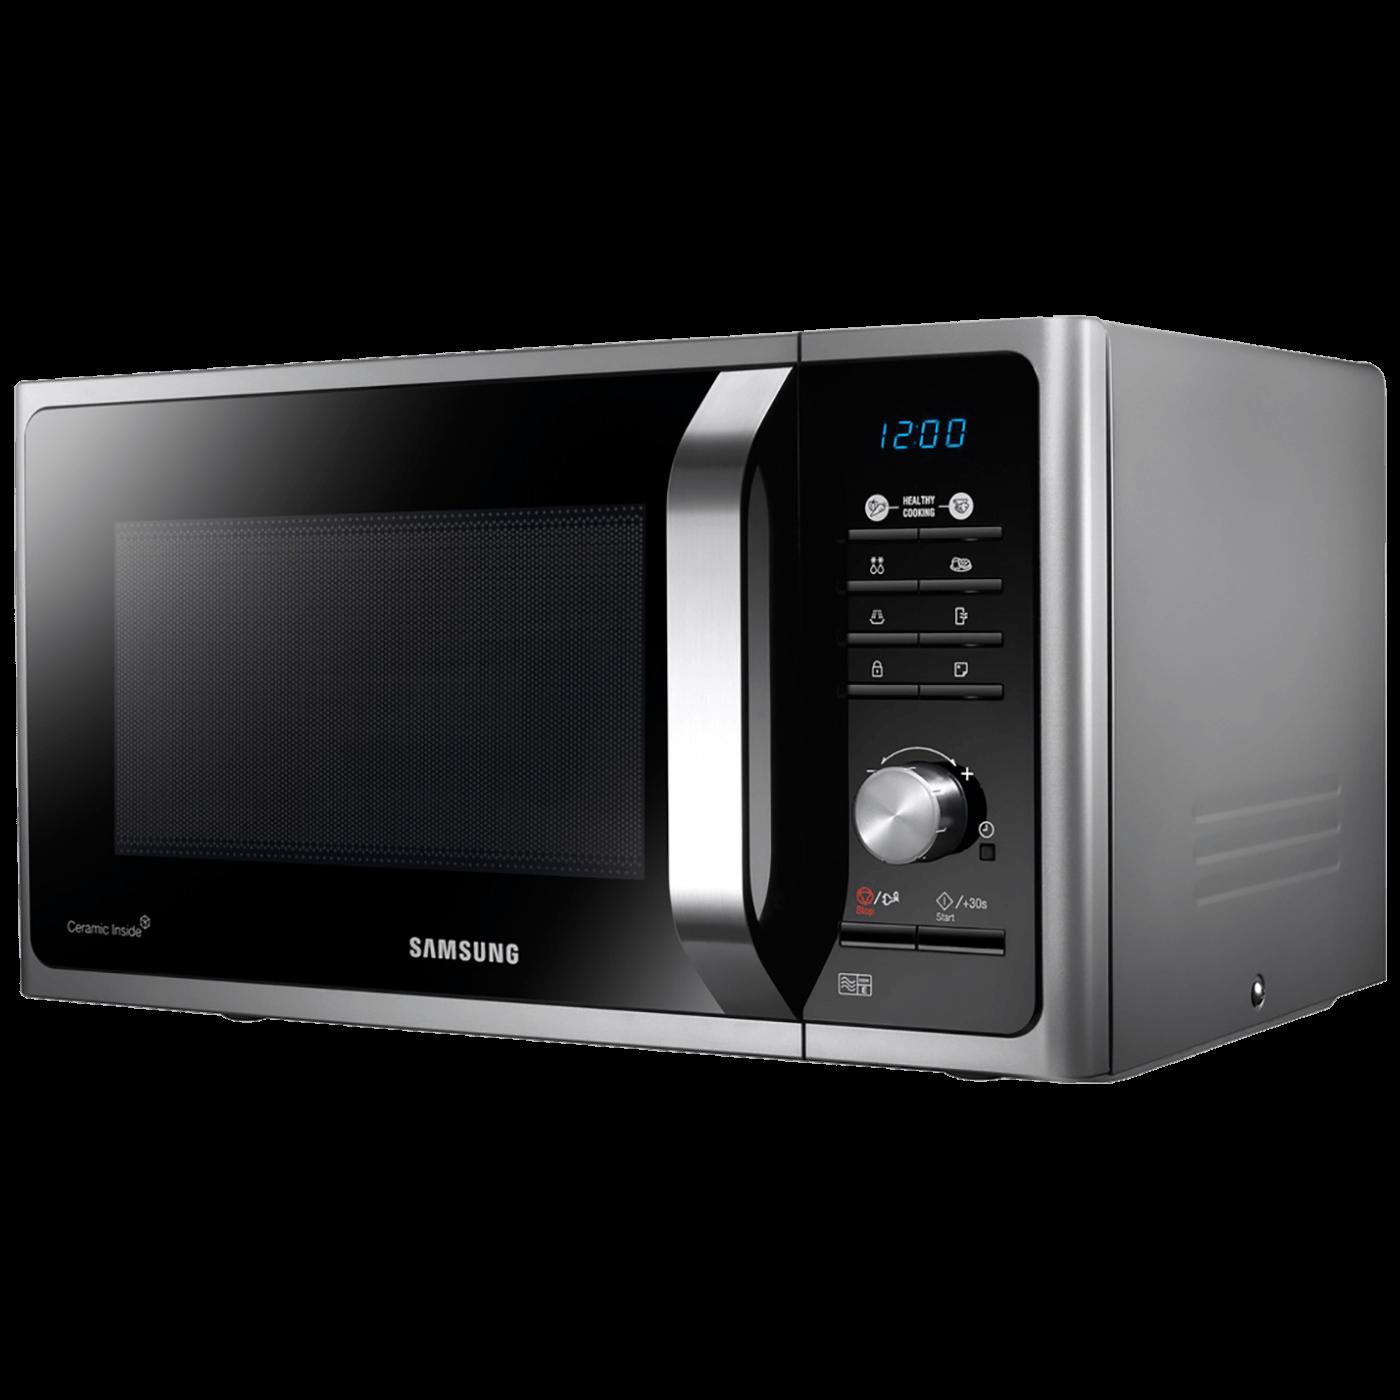 Mikrovalna pećnica, 800 W, zapremina 23 lit.